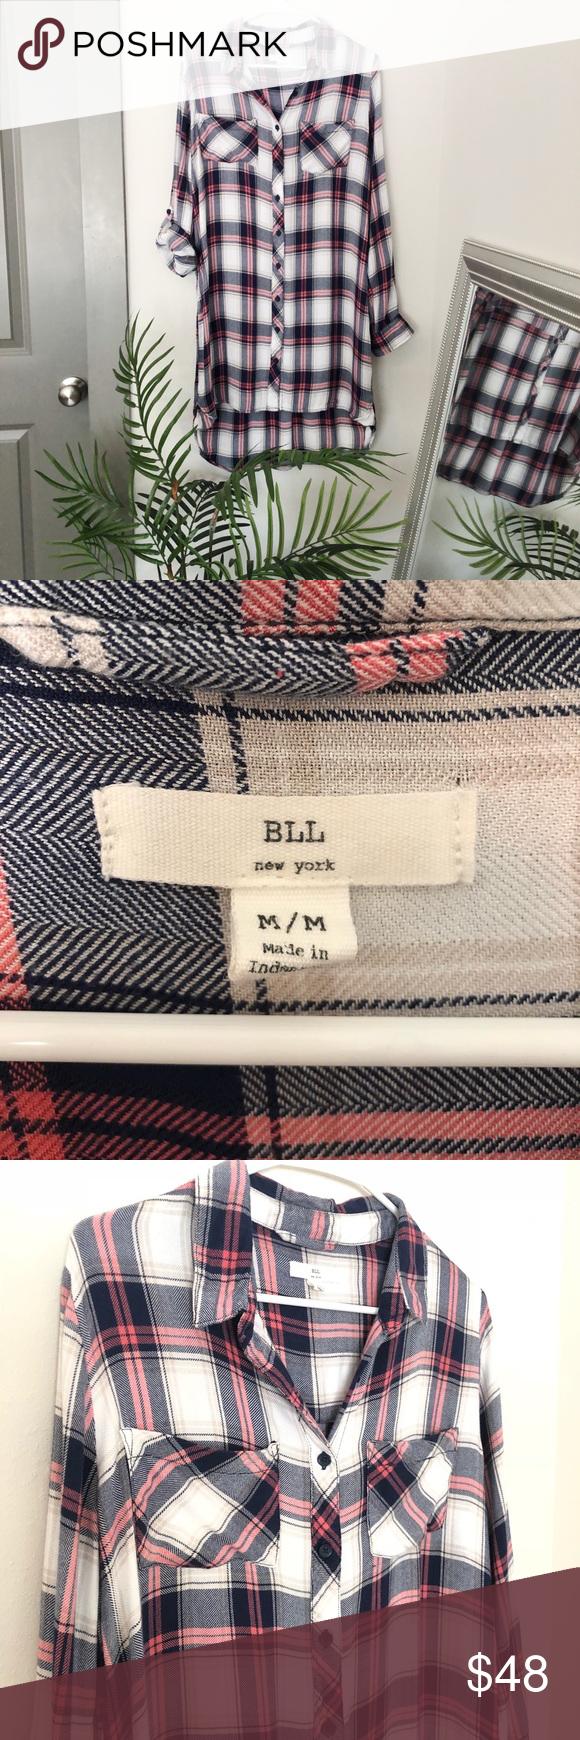 Off white red flannel shirt  BLL plaid button down dress  My Posh Closet  Pinterest  Plaid